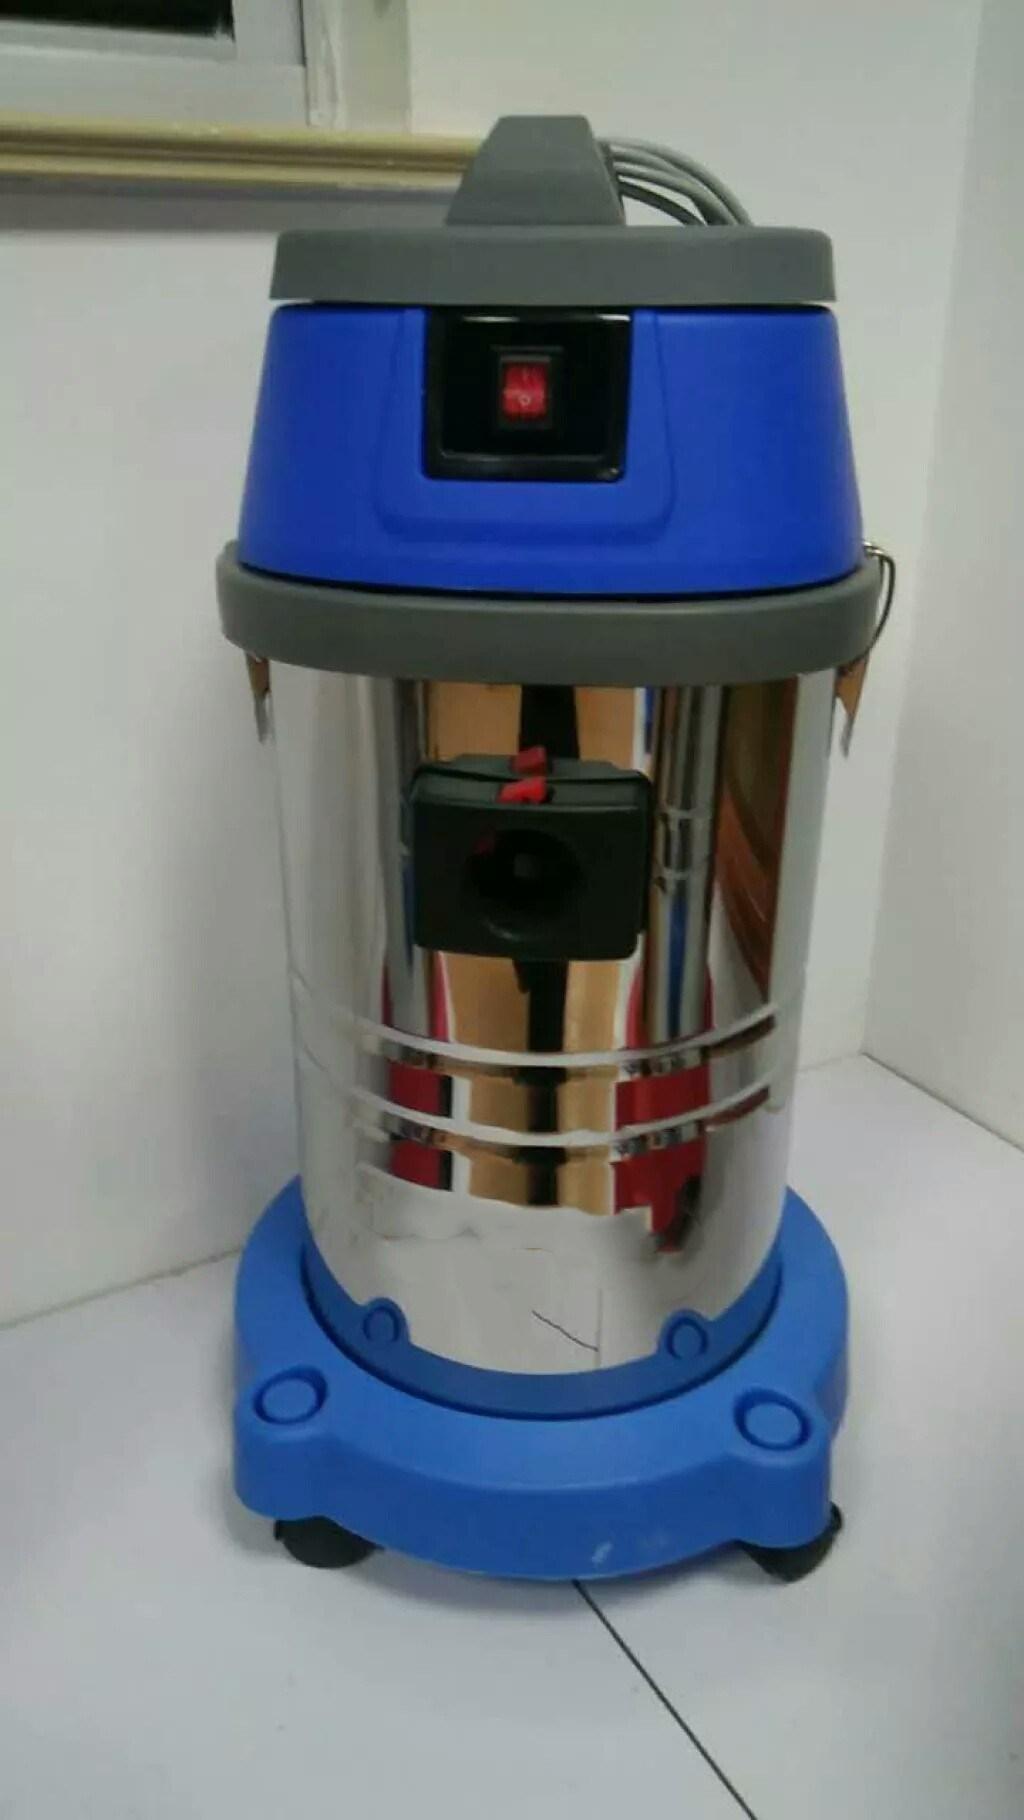 [Hot Item] Domestic Dark Blue Color Wet and Dry Vacuum Cleaner Cc-35L